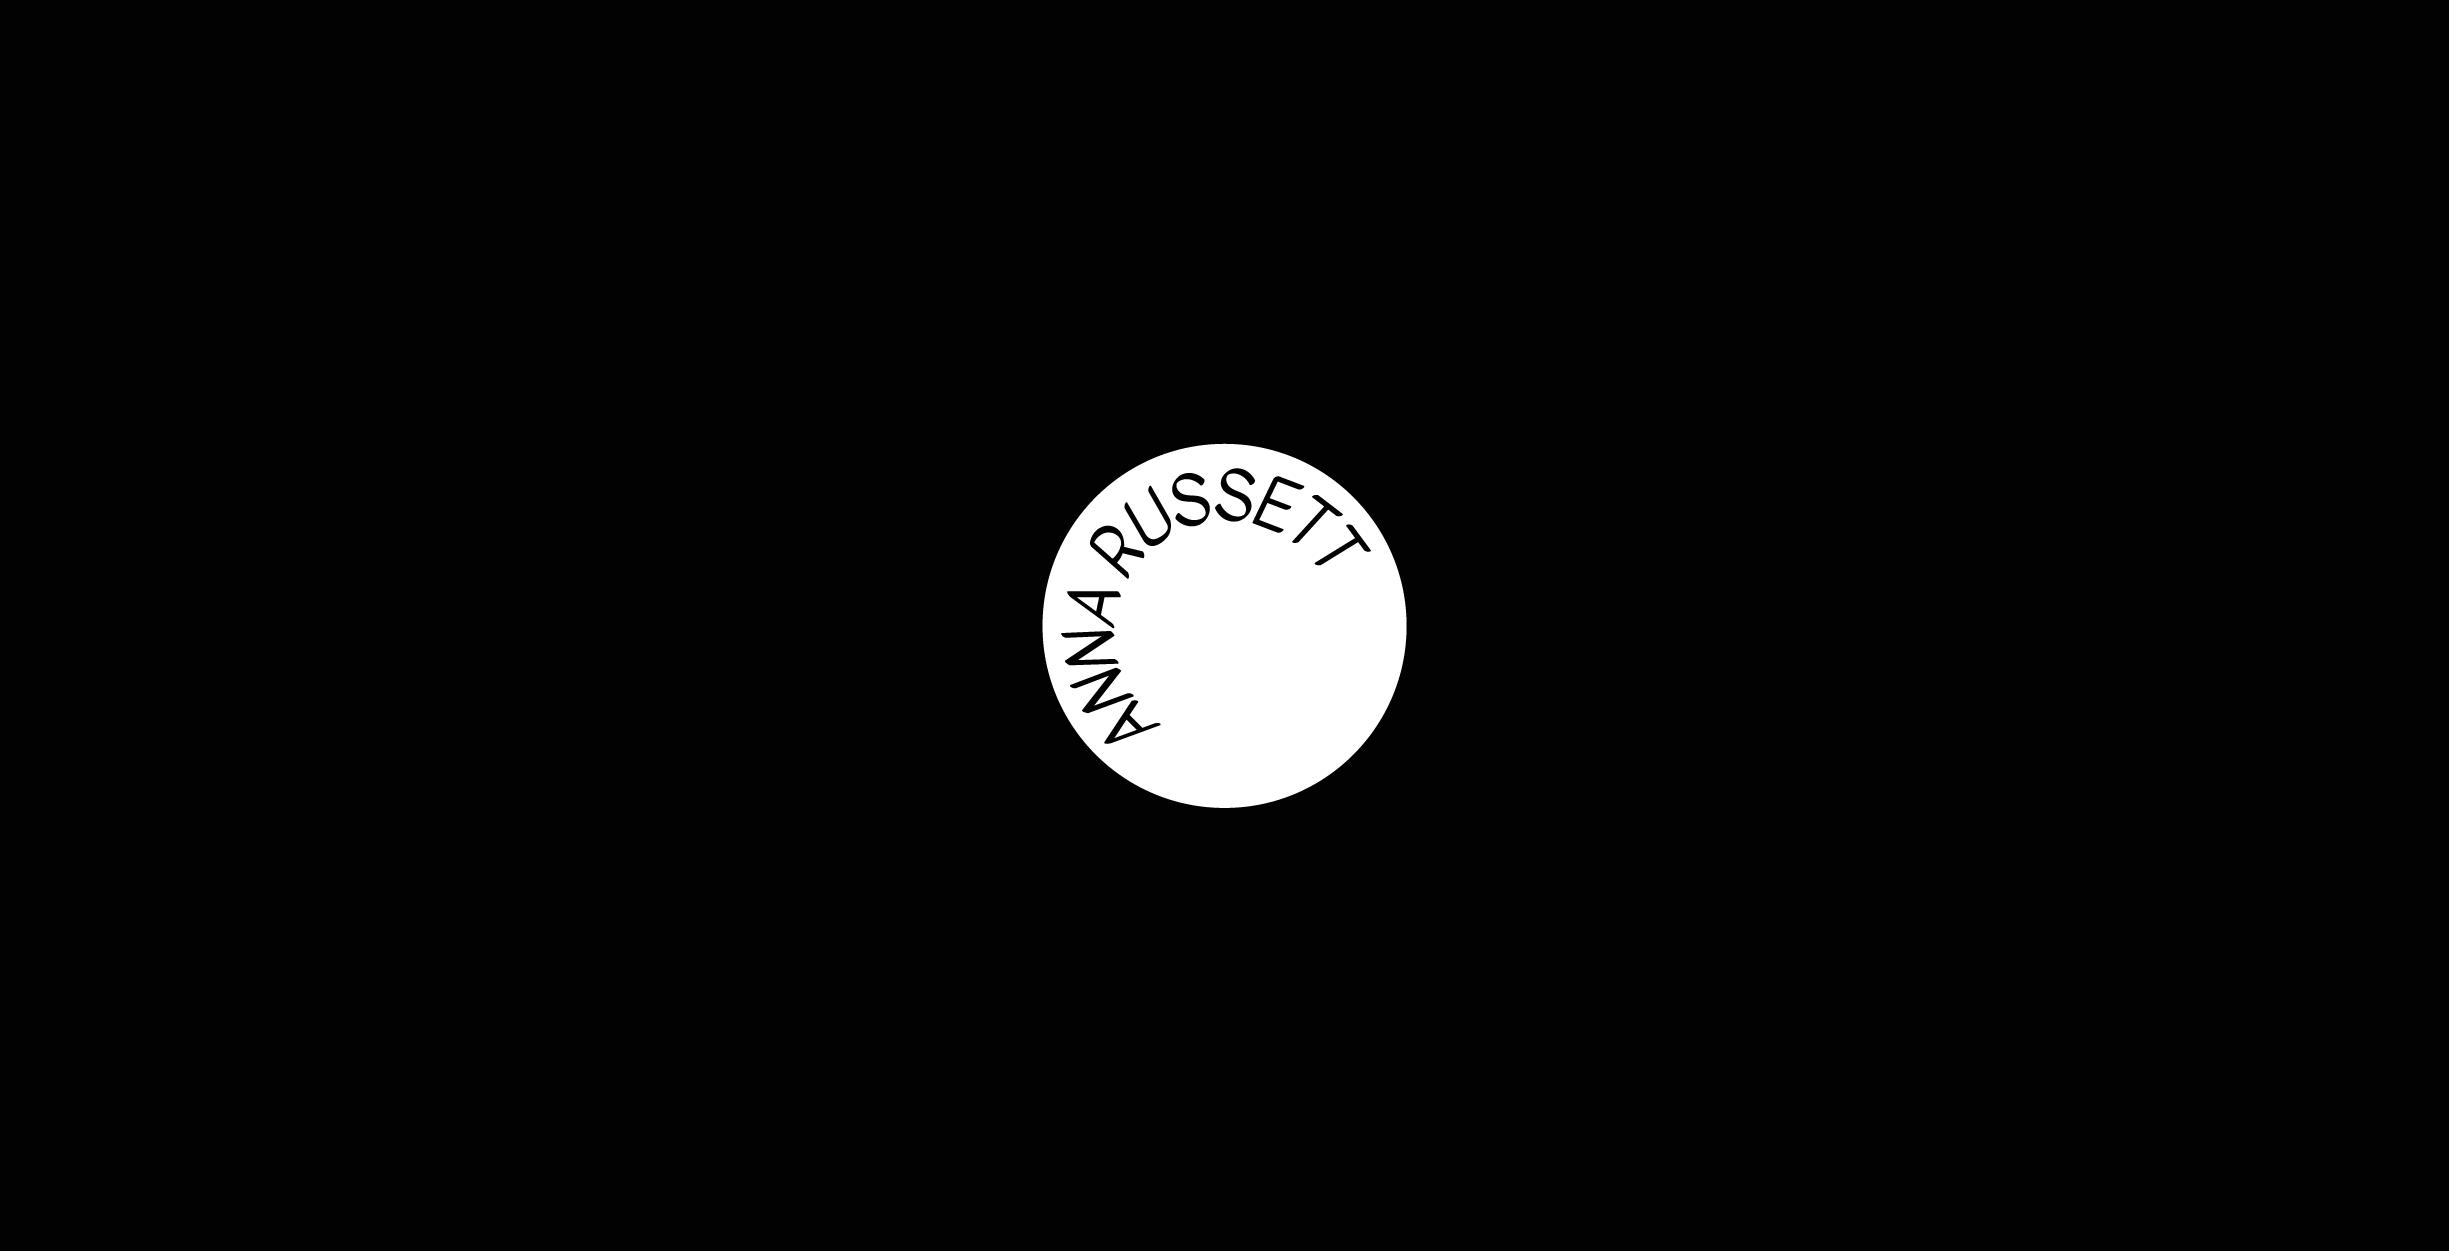 logos-2-v4-17